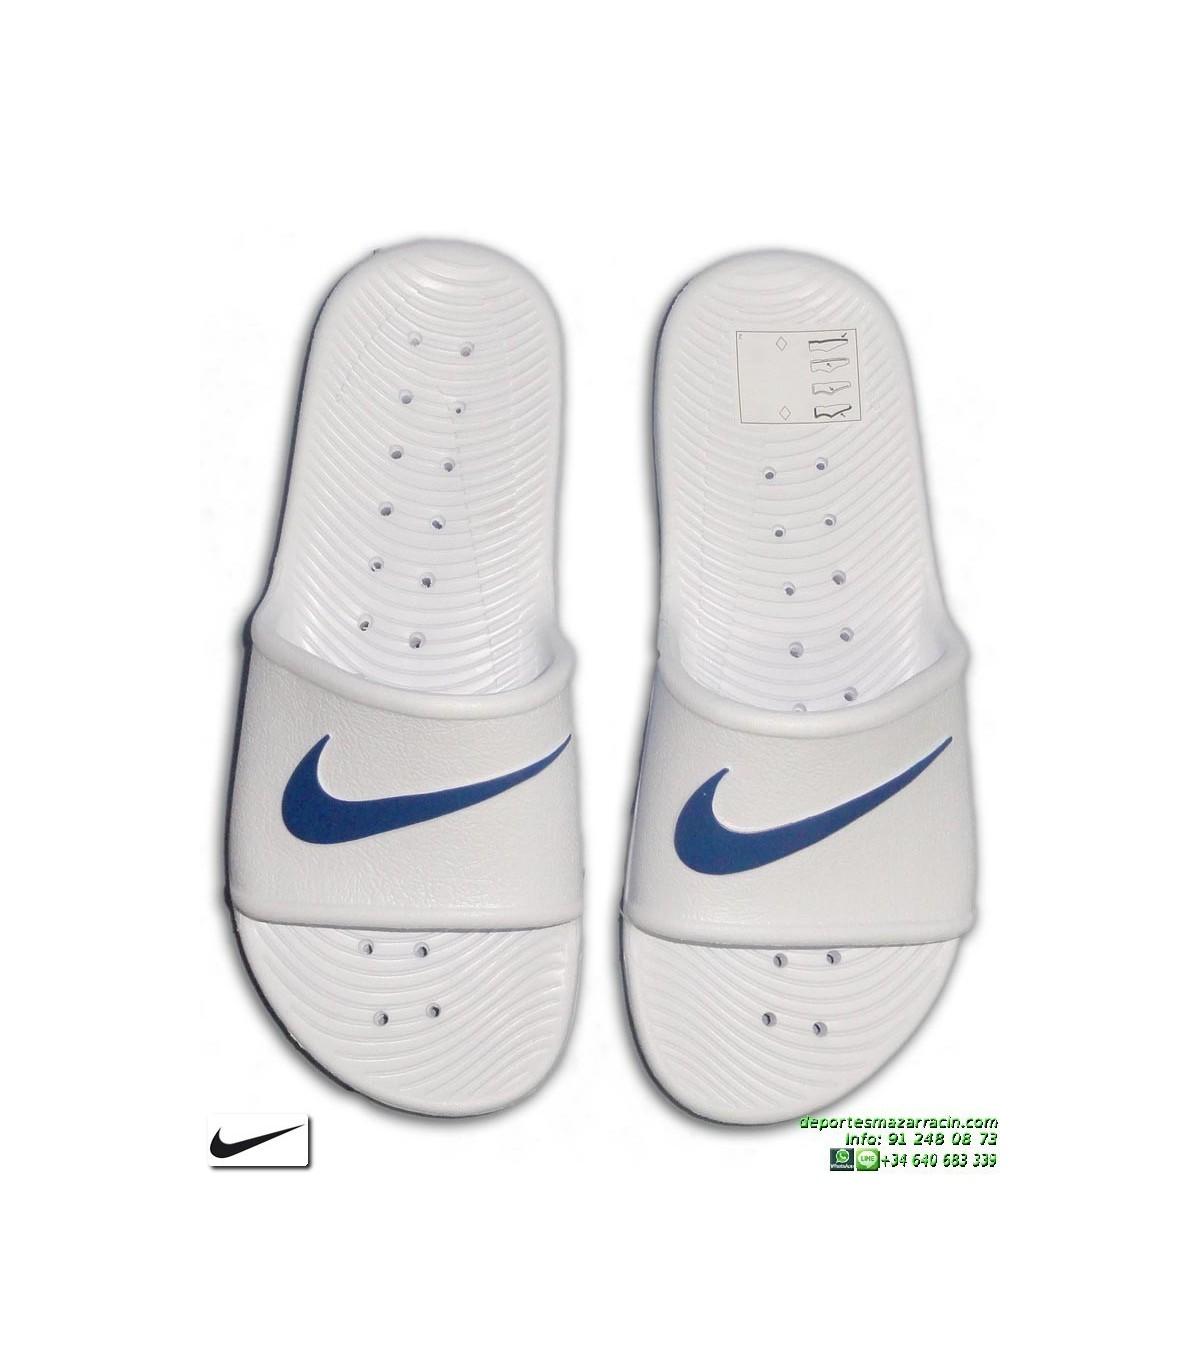 Zapatos Hombre Y Shower Chanclas Nike Piscina Kawa Playa Para De ukXiTOPZ